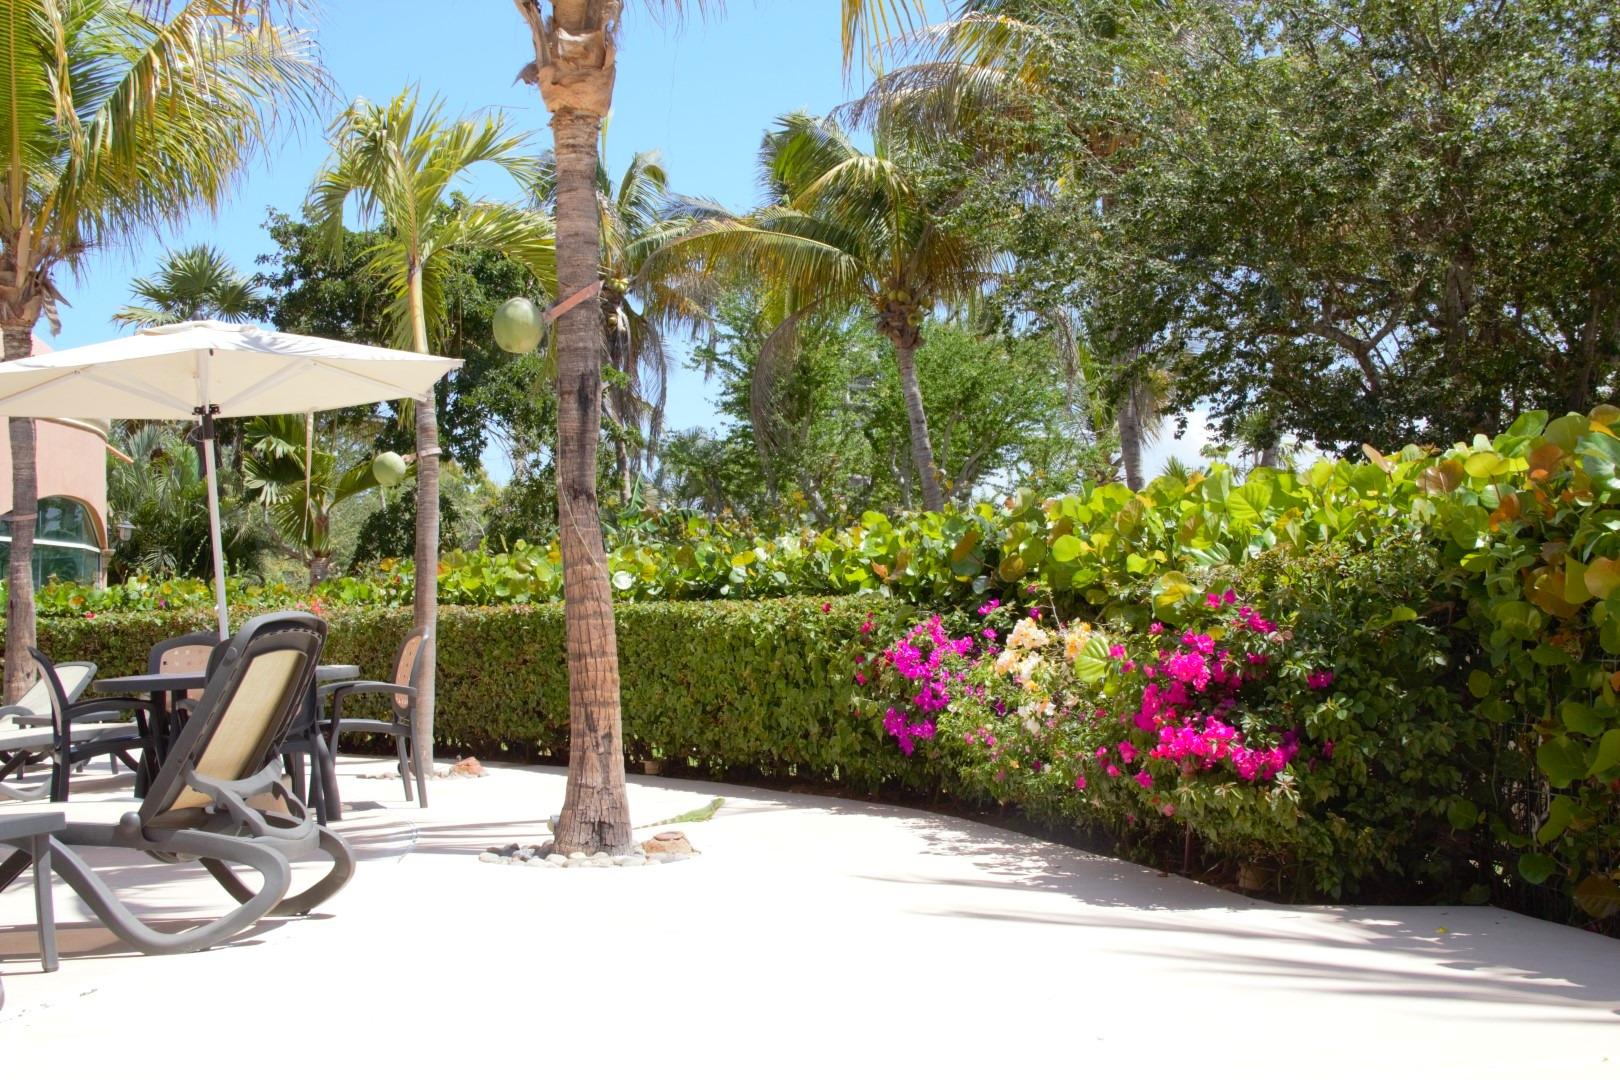 Seating and shade around pool.